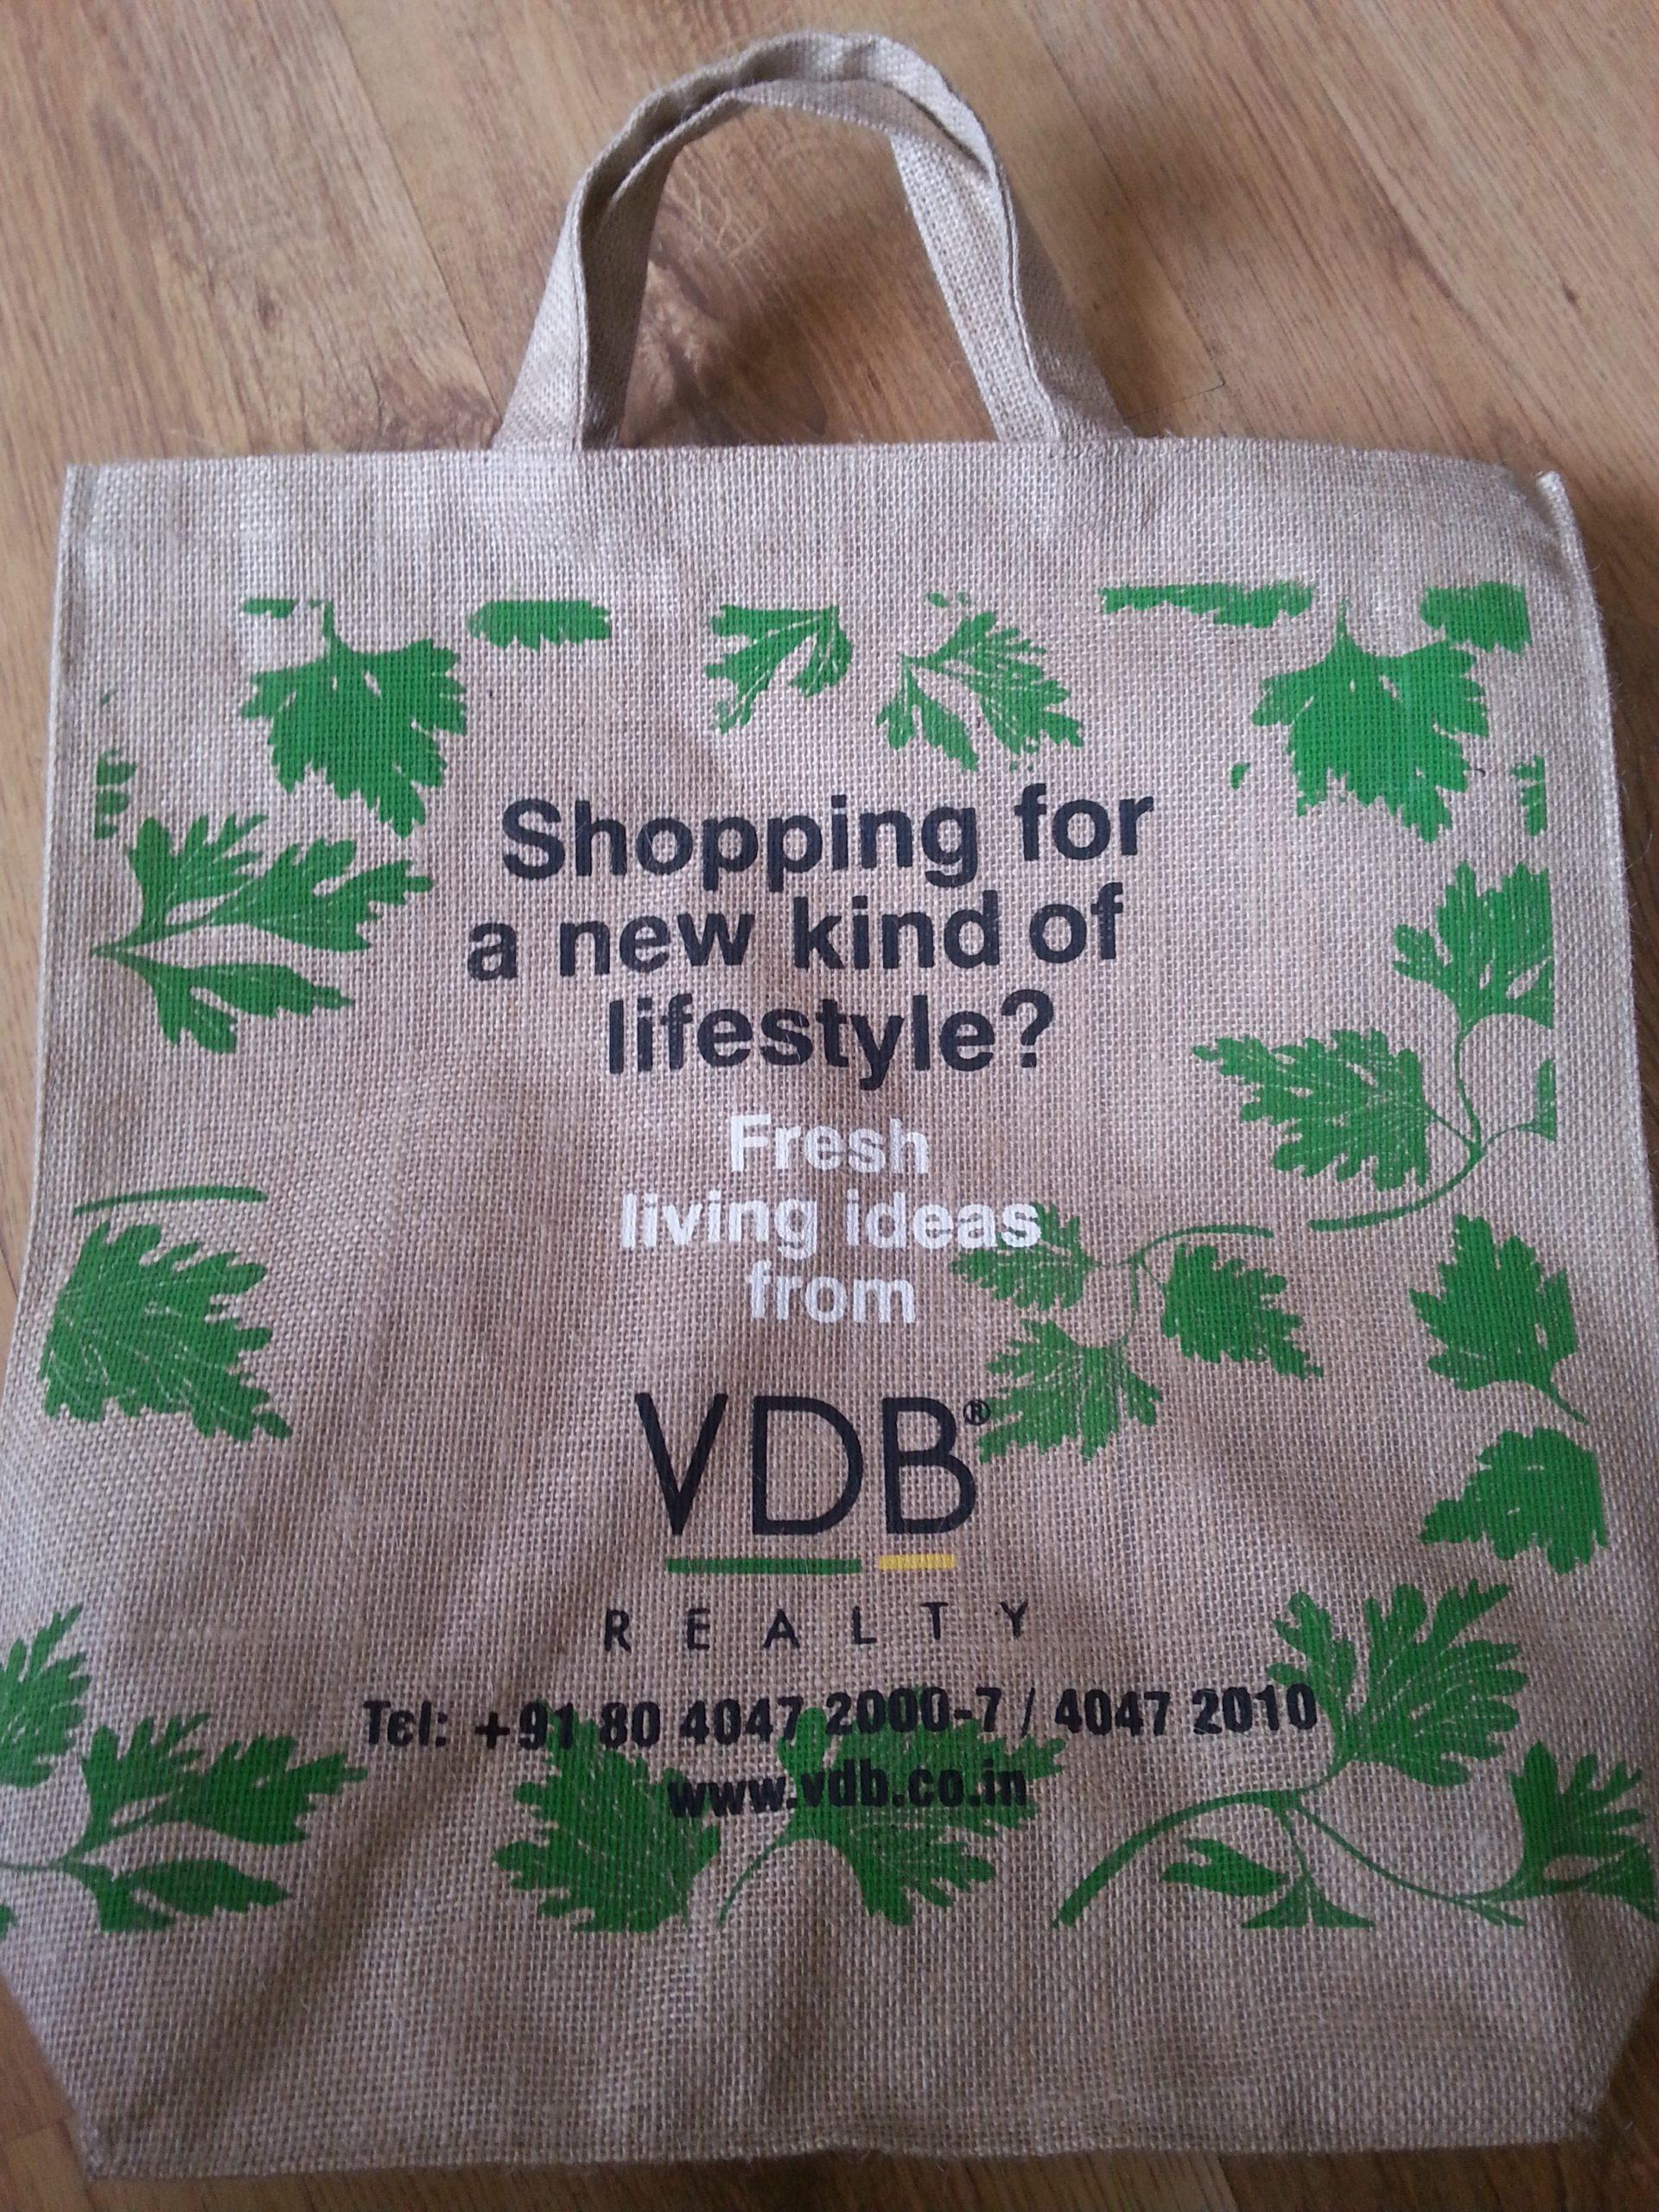 Rent-a-Shopping Bag